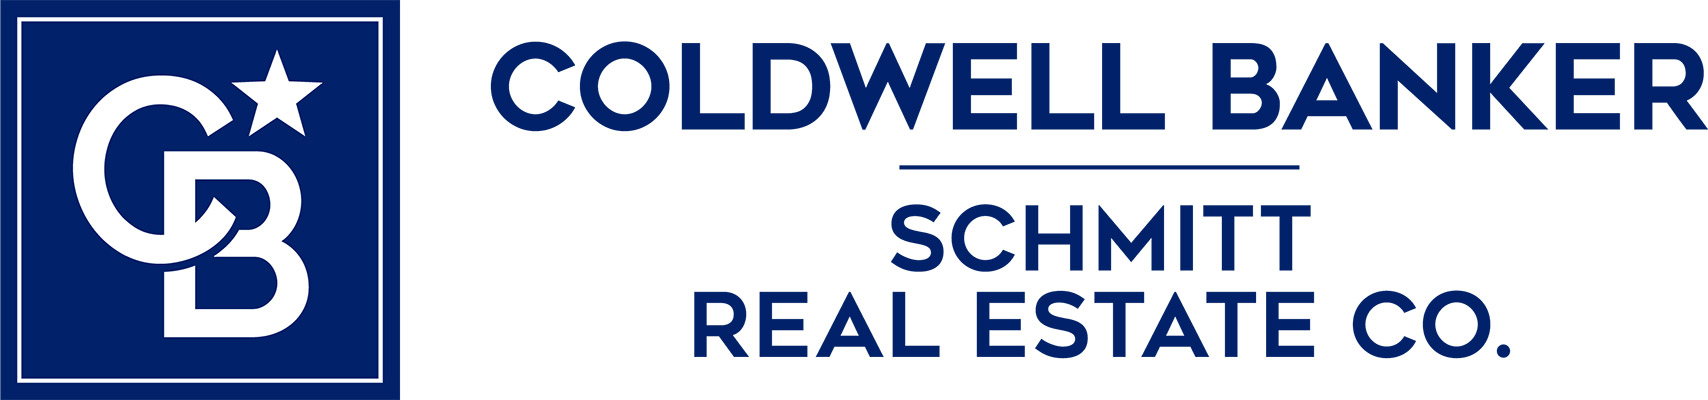 Fred Mullins - Coldwell Banker Logo